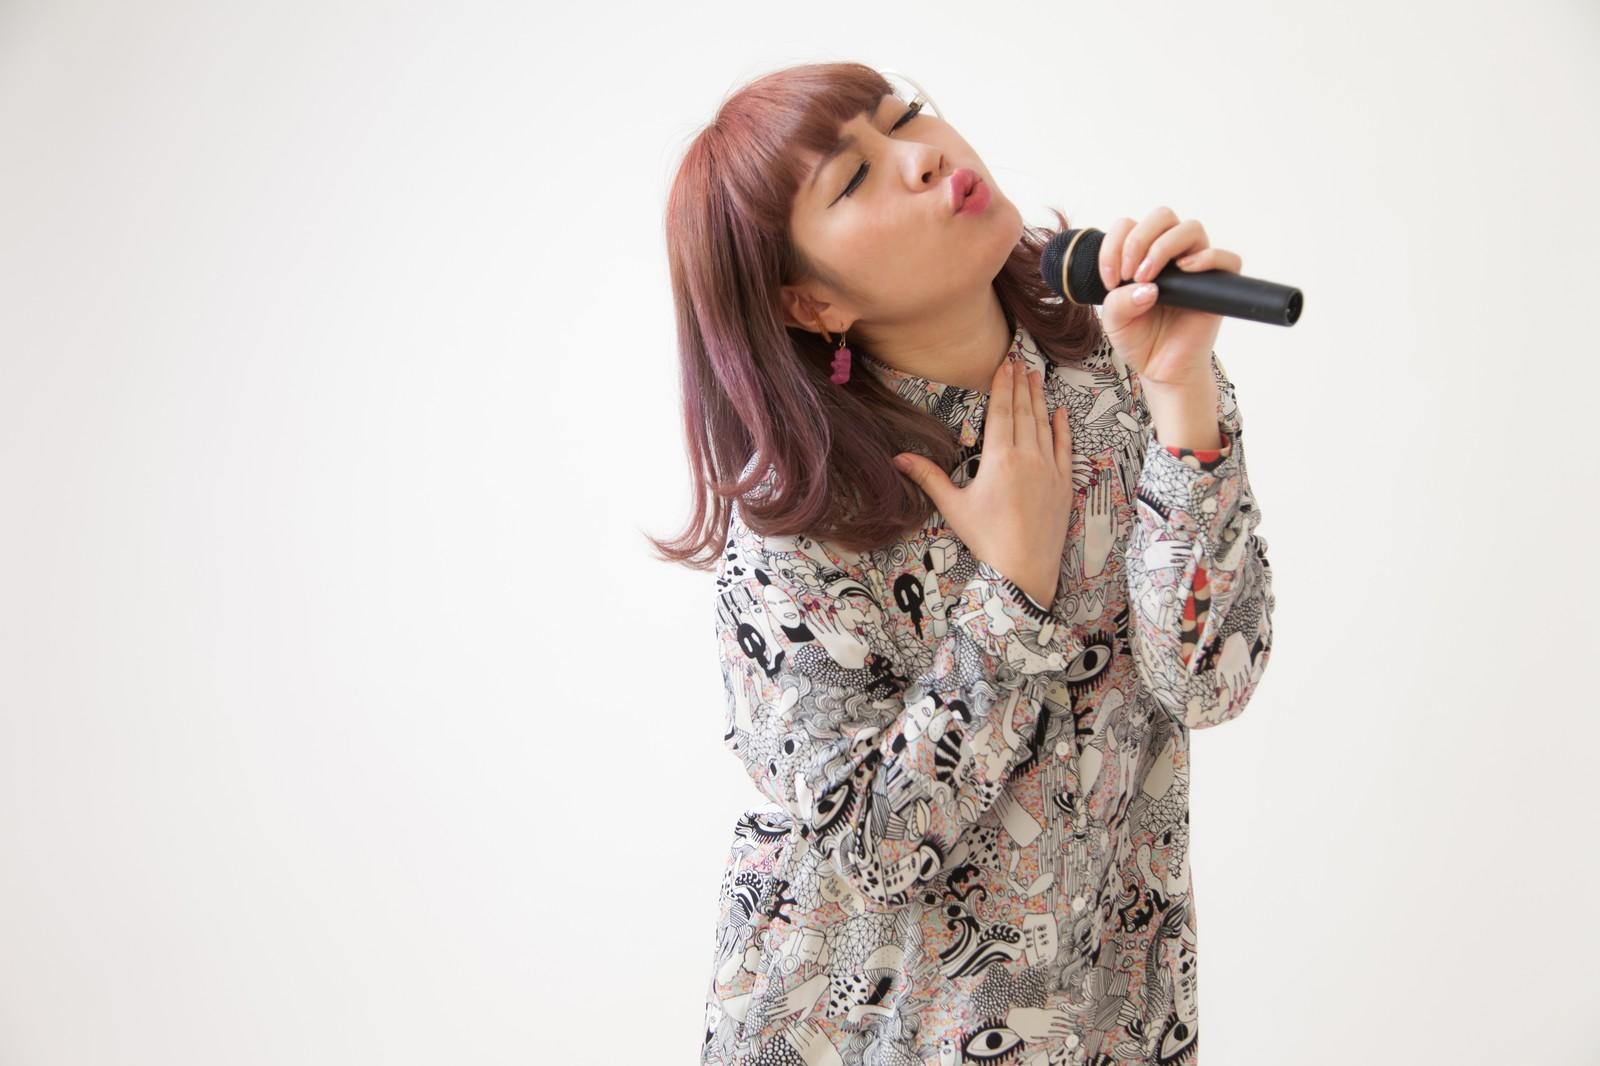 http://kouraininjins.info/images/karaoke.jpg